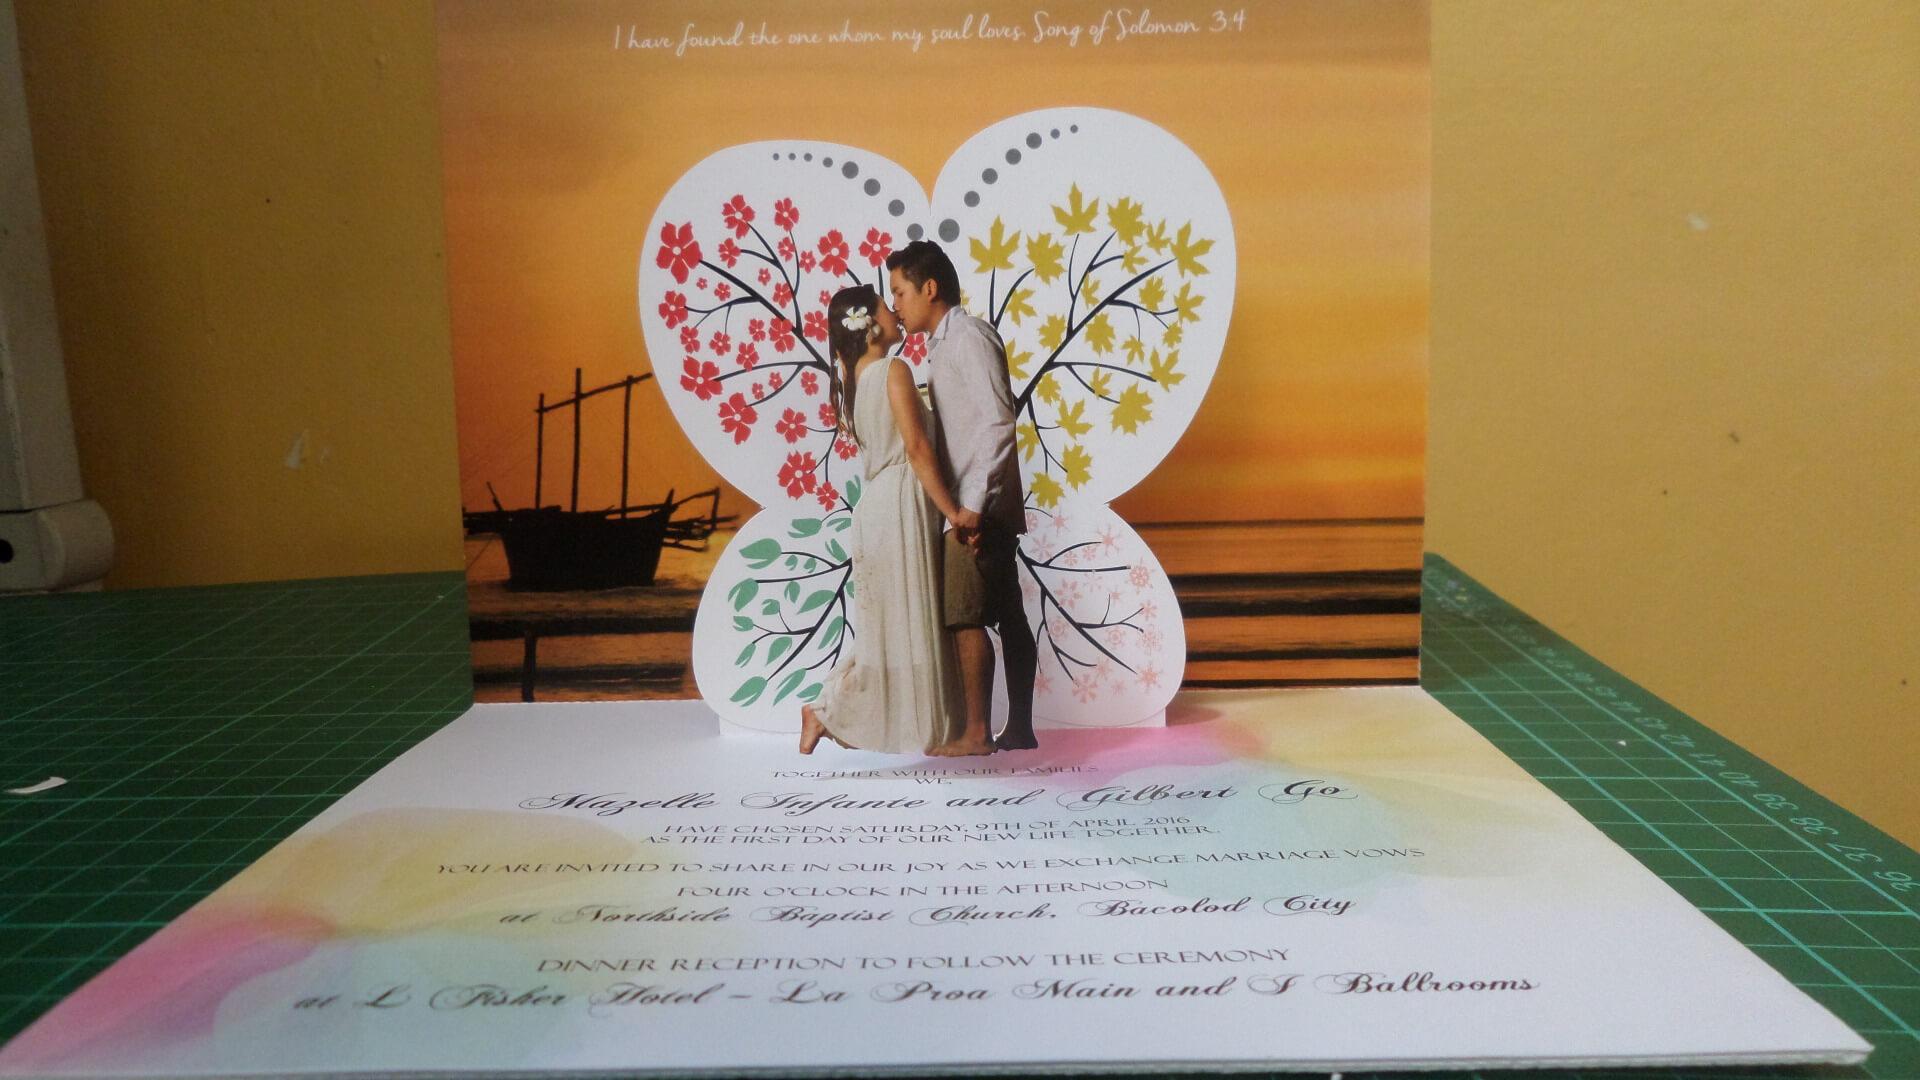 Wedding Pop Up Invitations | Pop Up Occasions regarding Pop Up Wedding Card Template Free